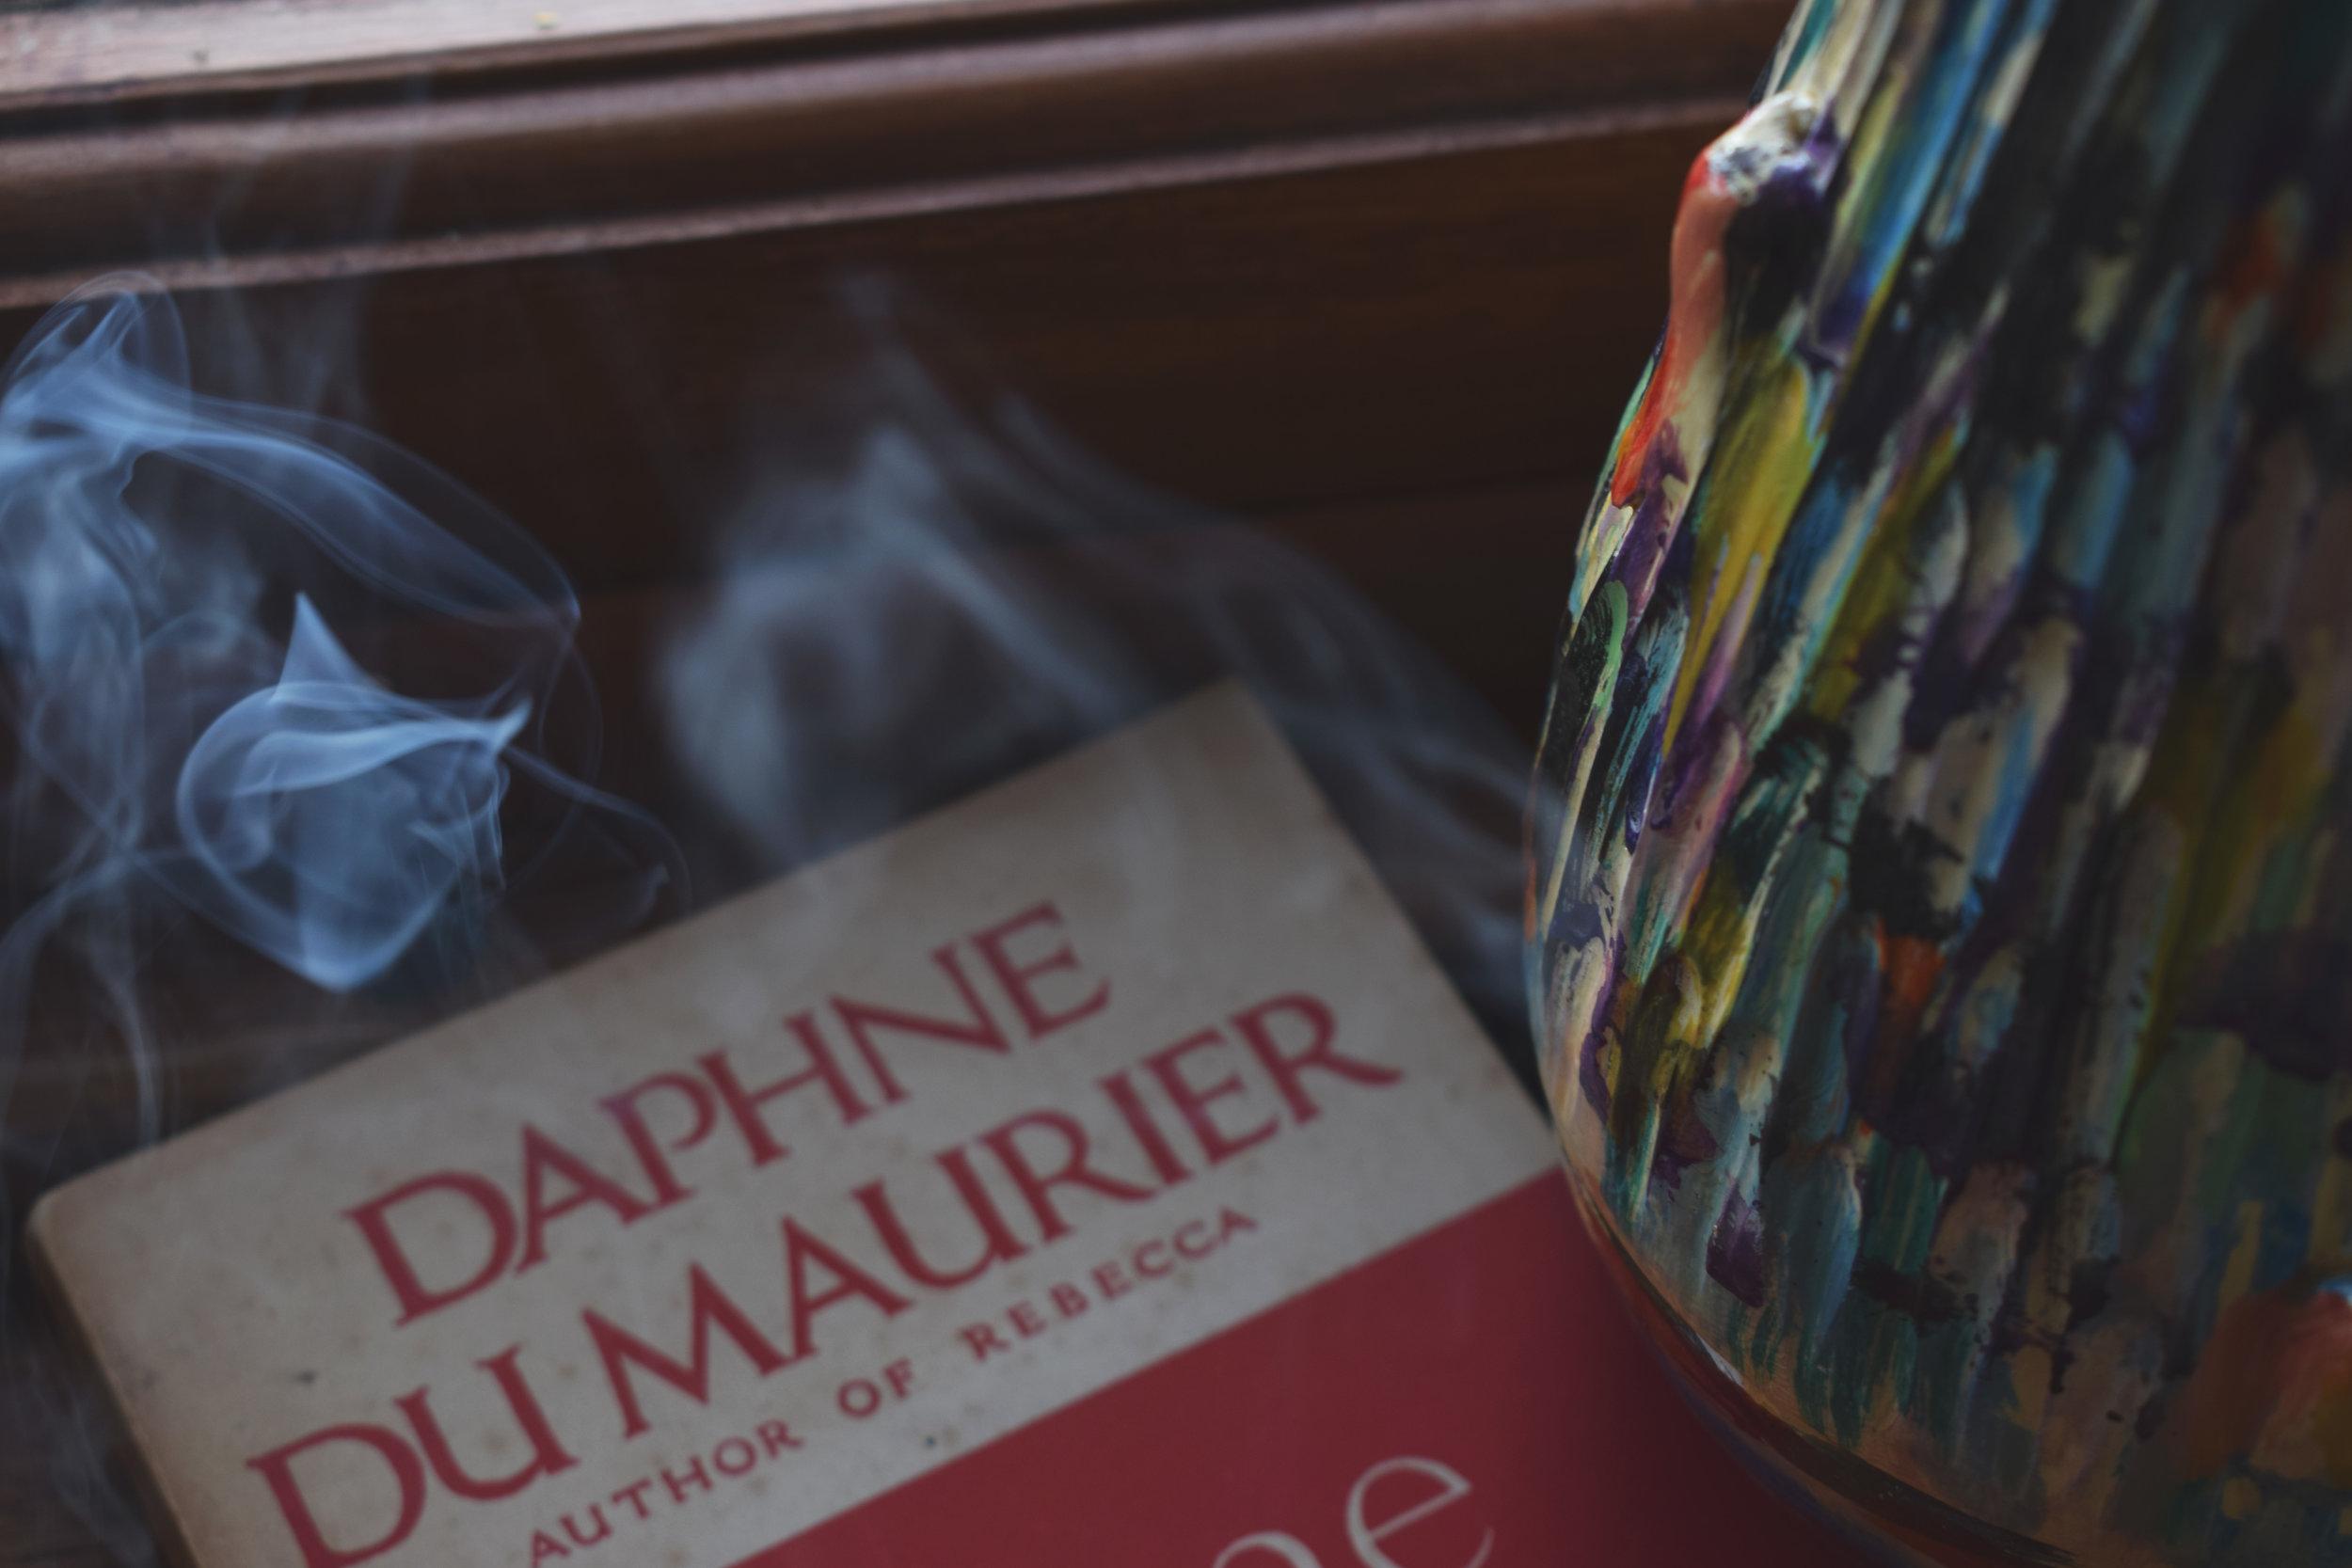 Daphner.jpg